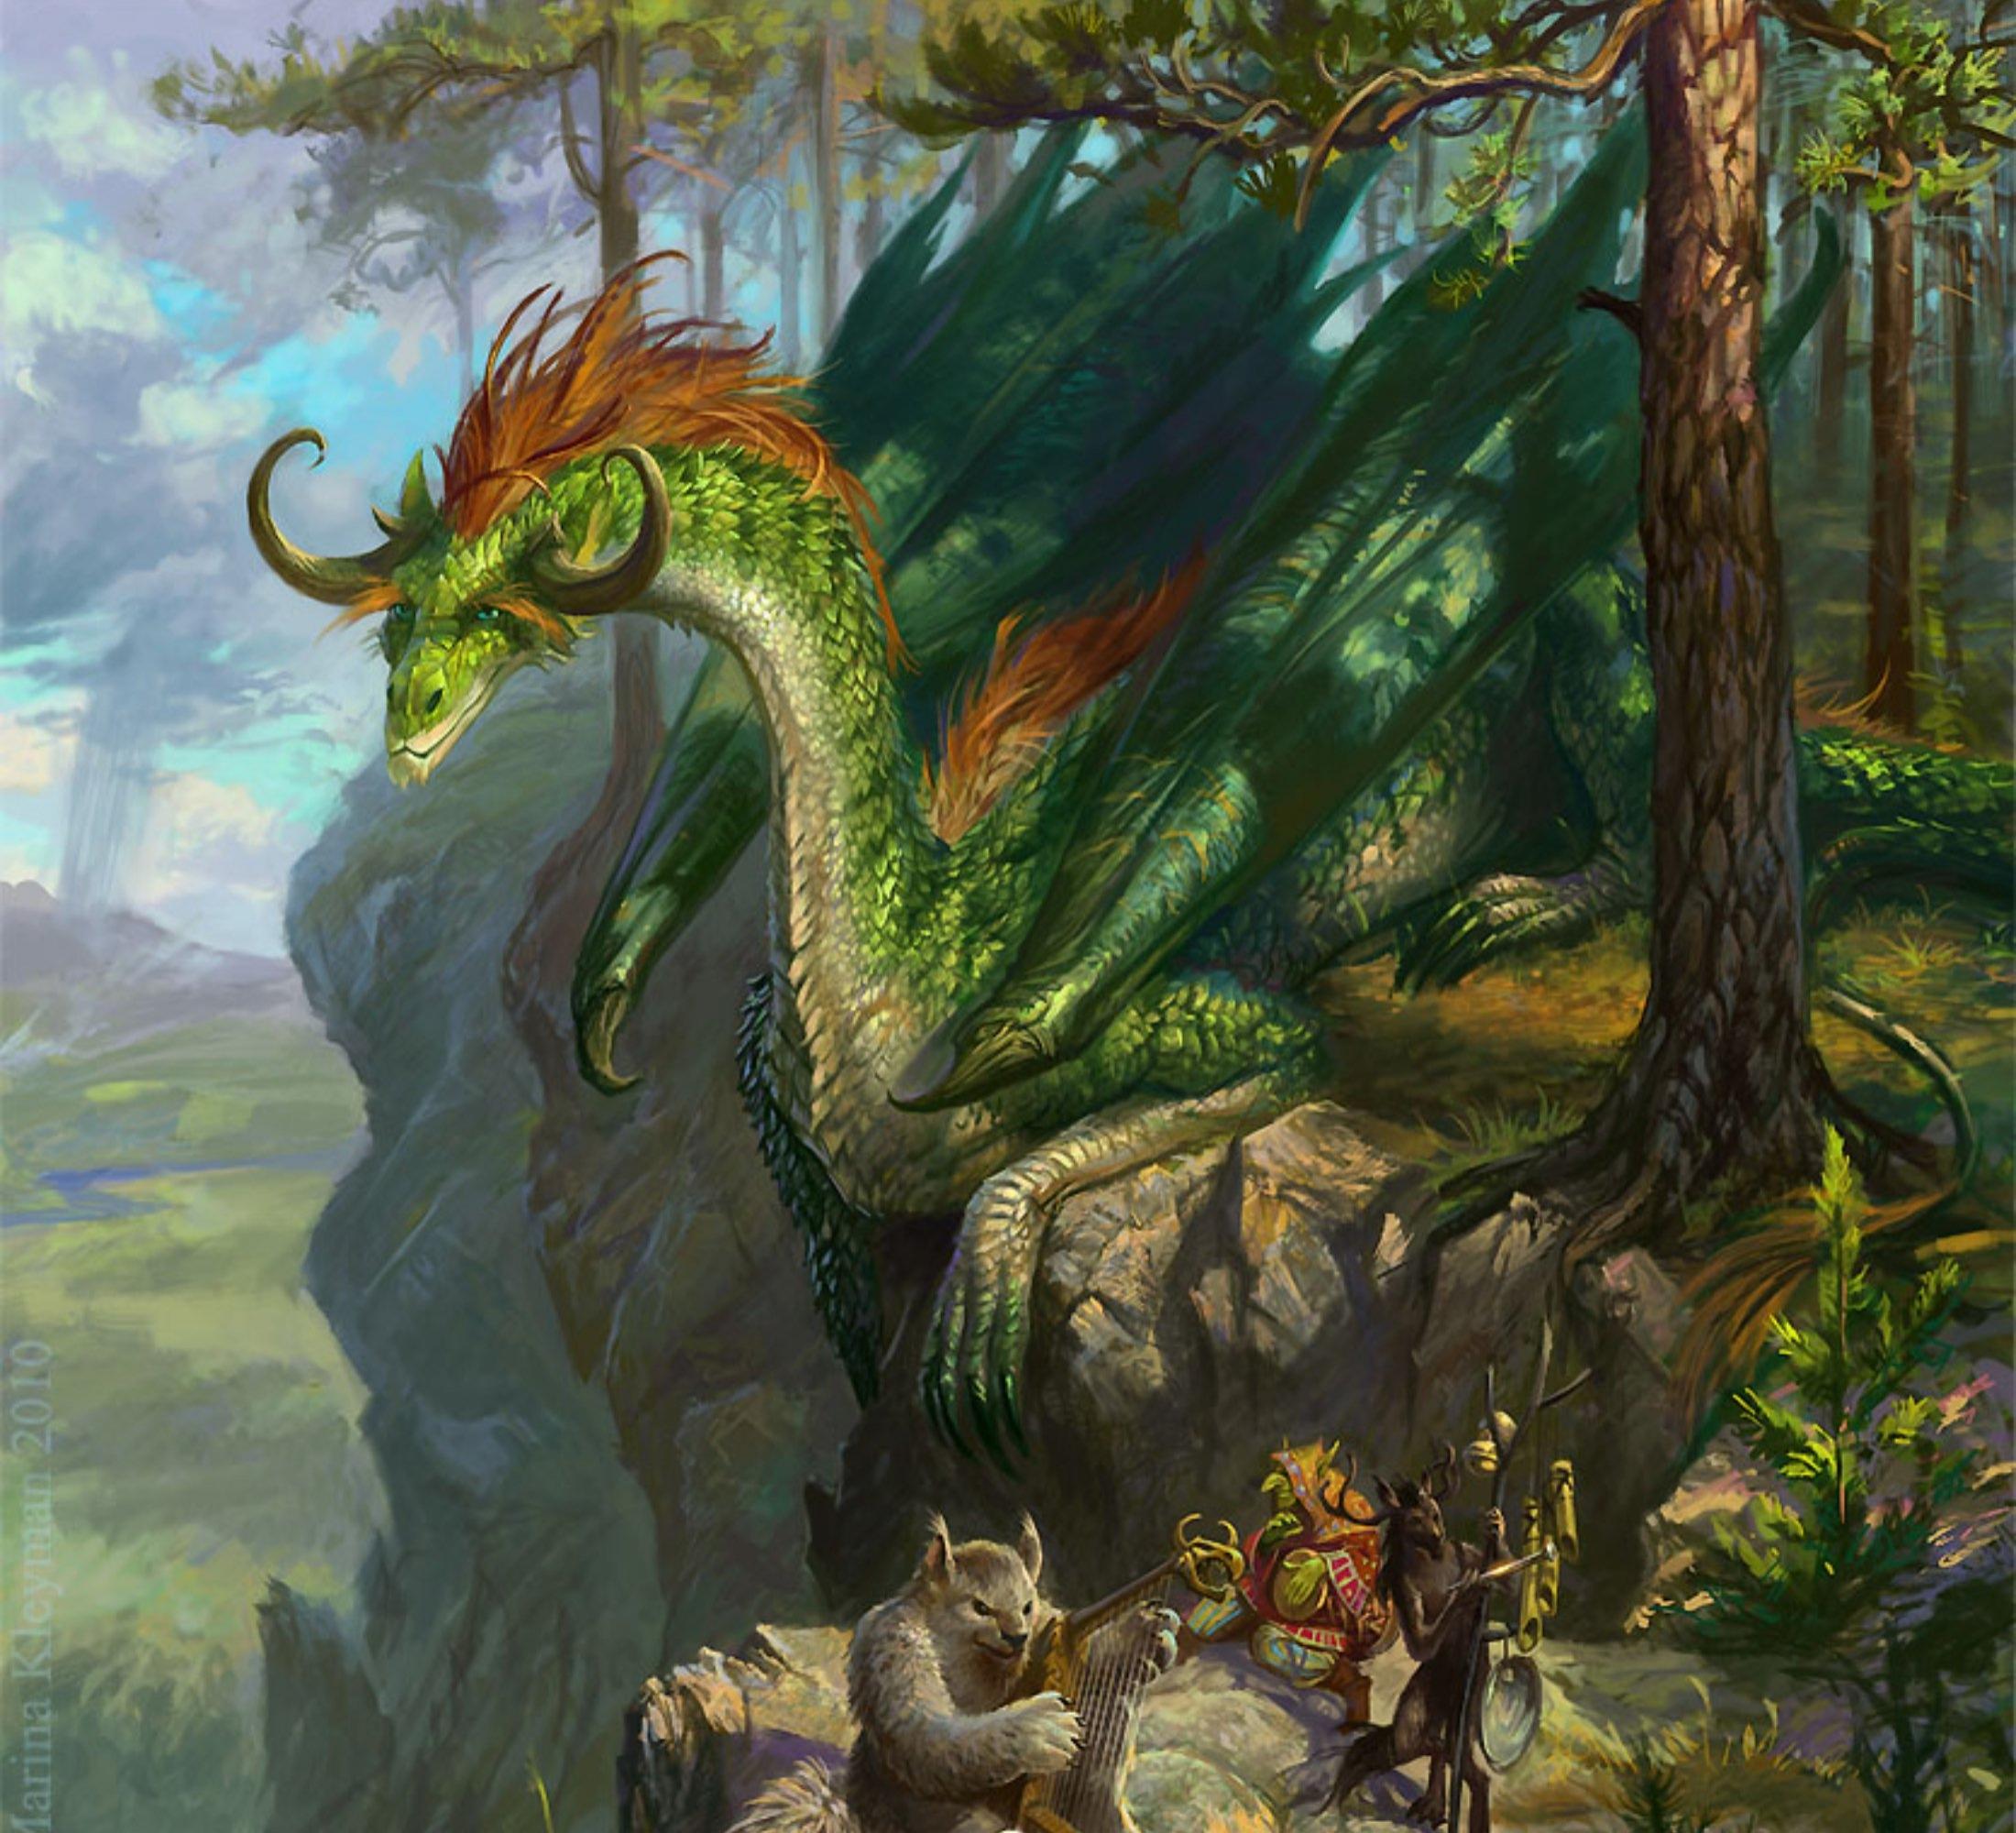 Green Desktop Wallpaper: Green Dragon Wallpaper